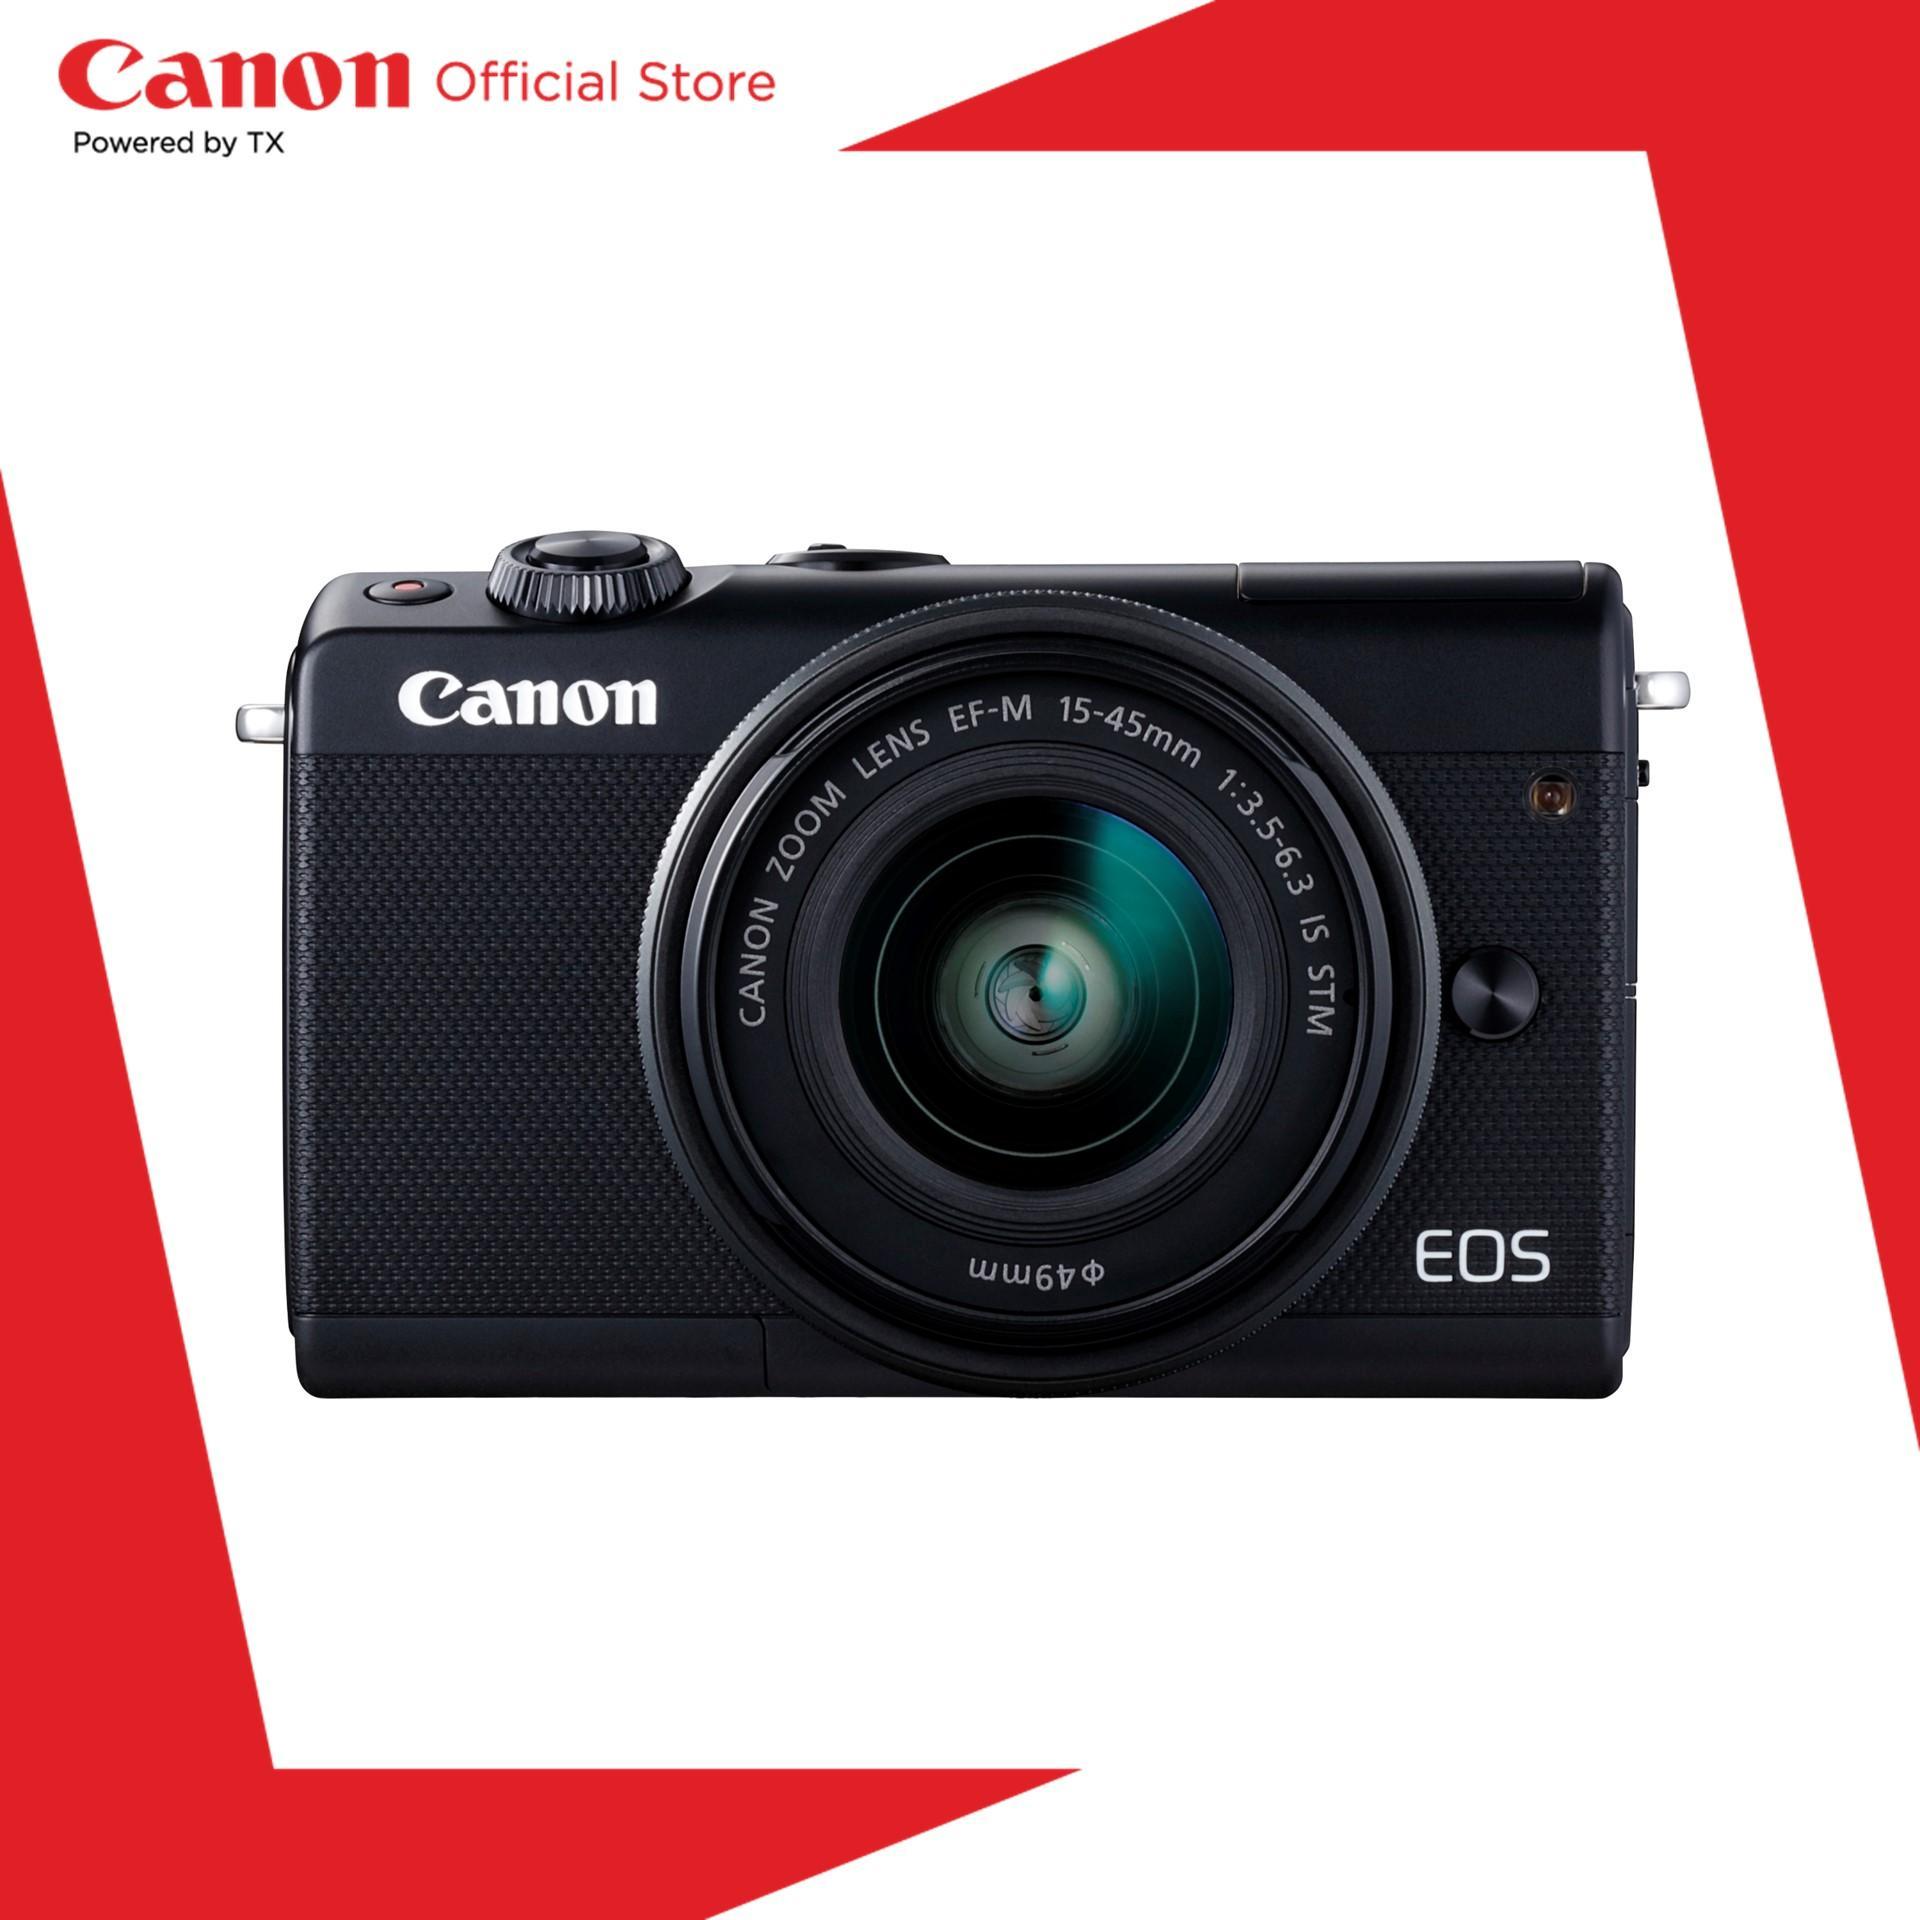 Canon Cameras Philippines - Canon DSLR for sale - prices